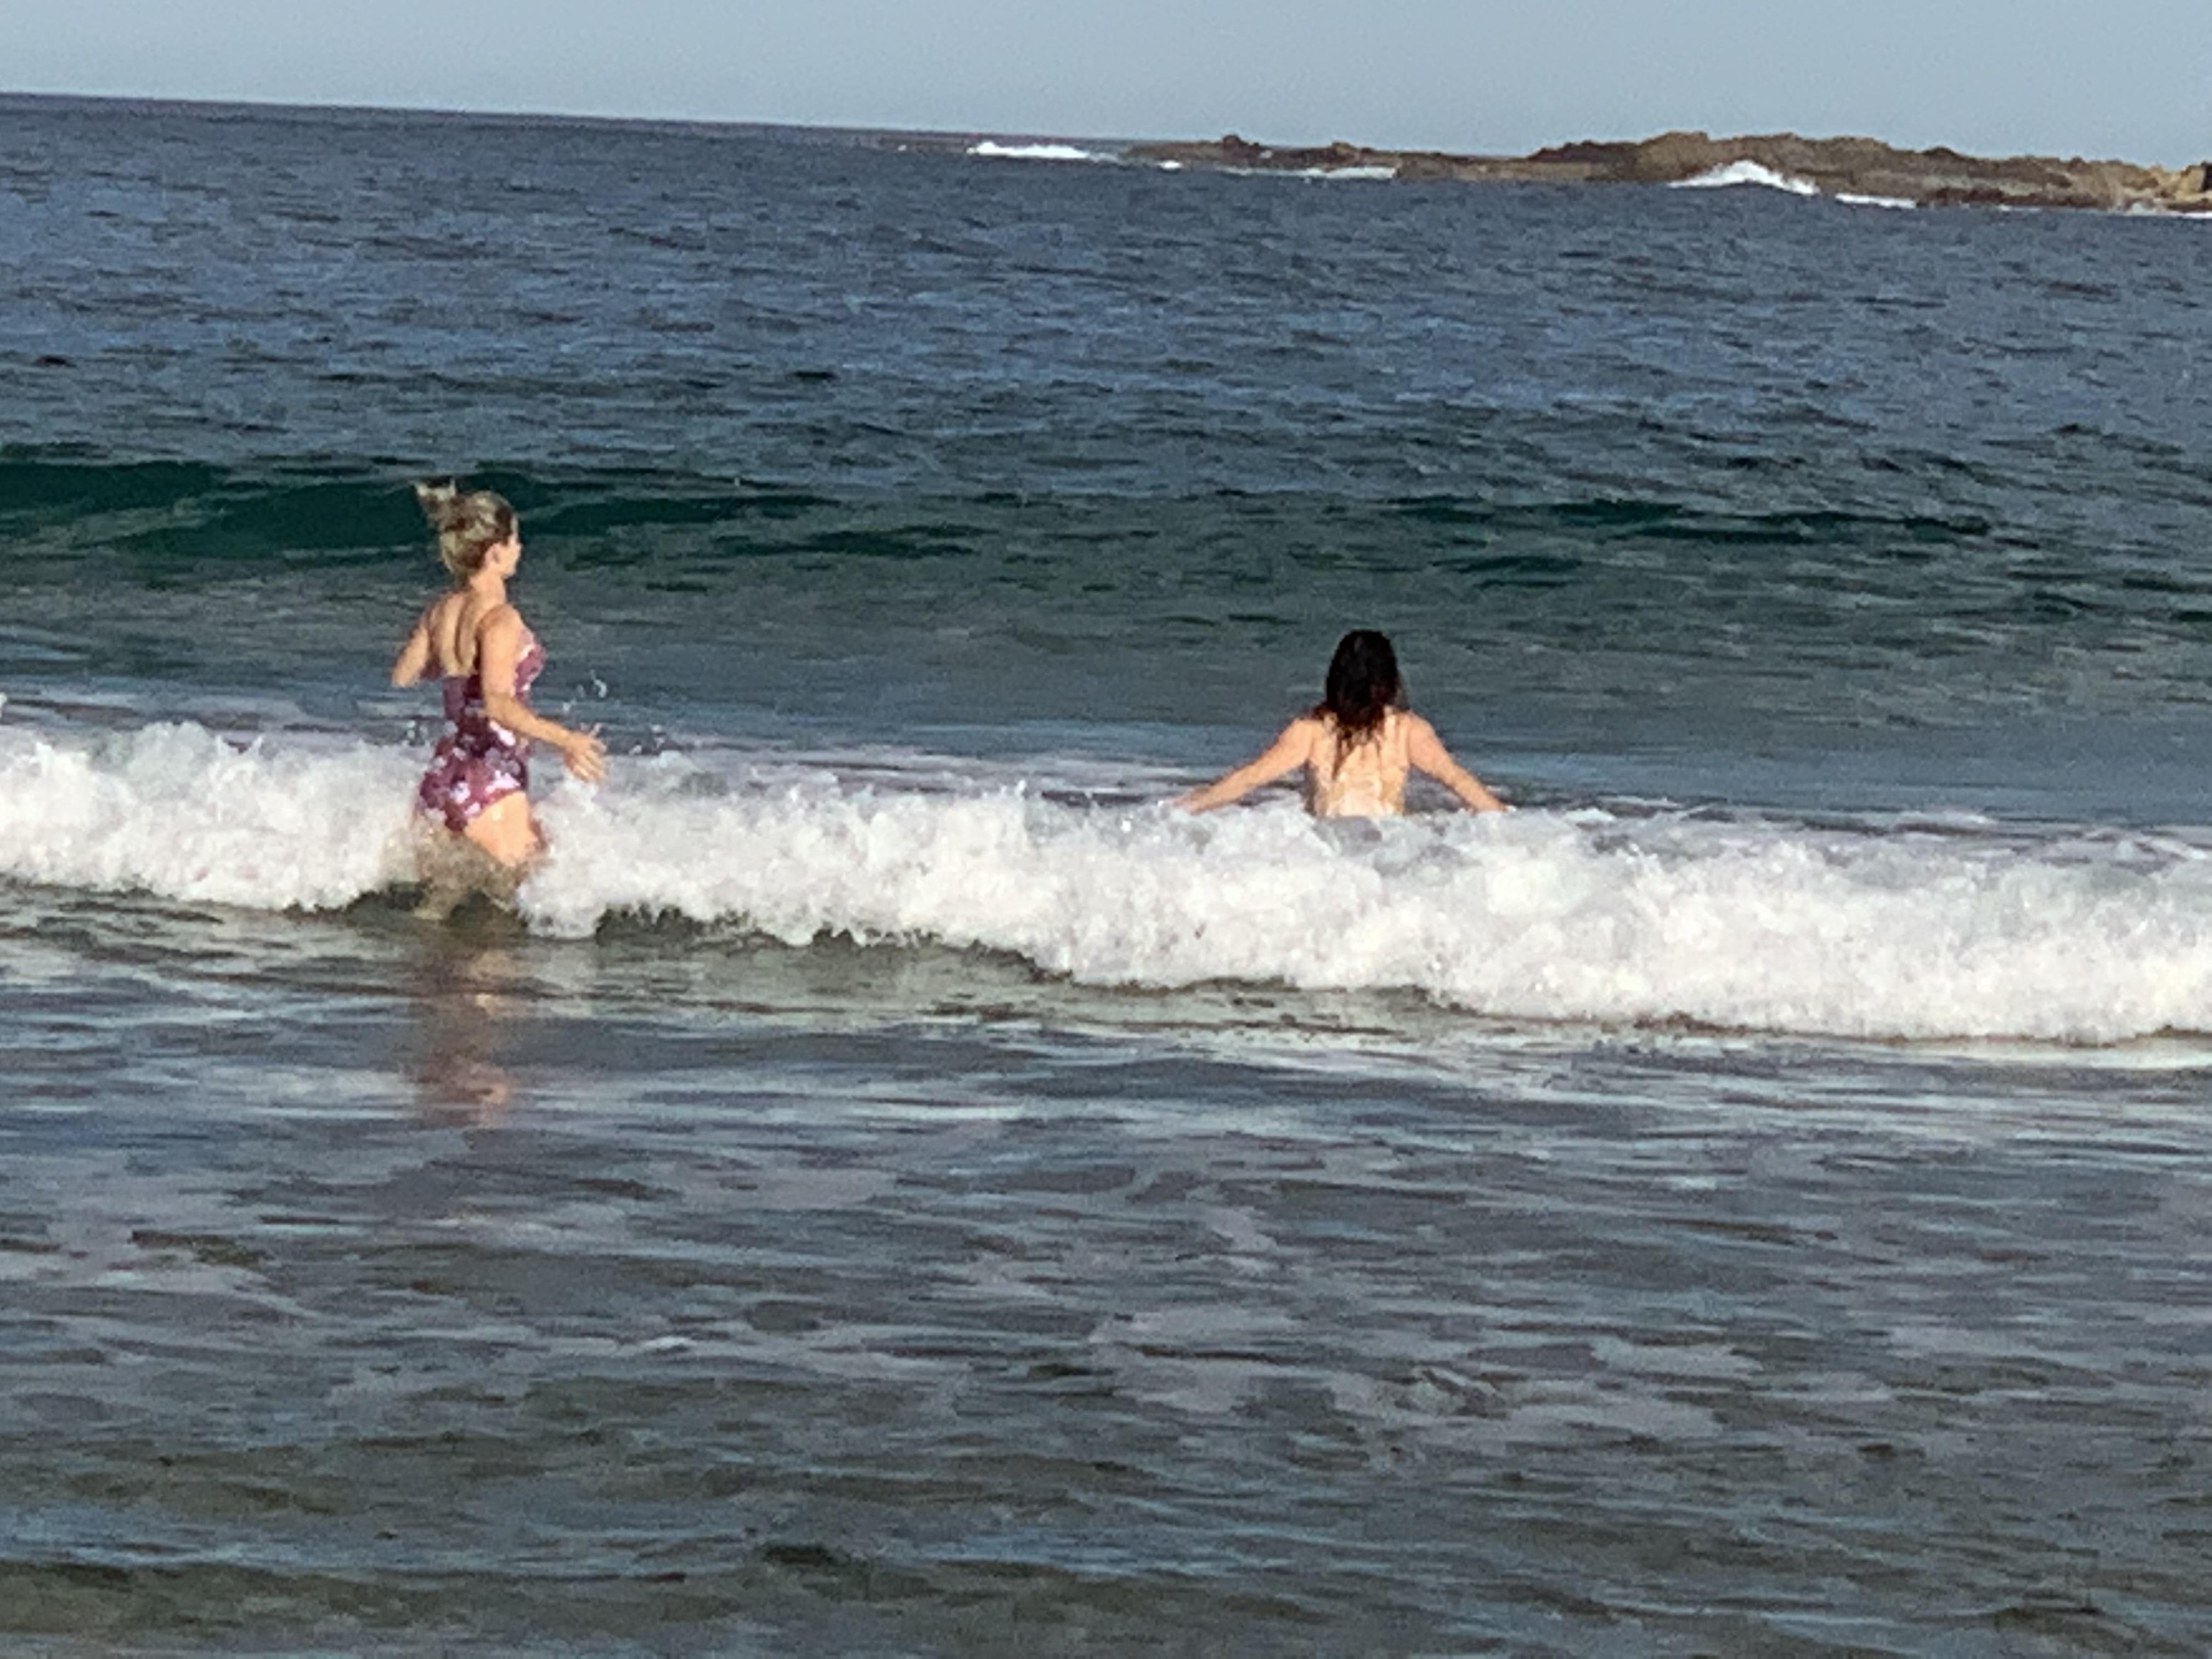 Beach-goers enjoy the relative solitude of Rosedale Beach. Photo: Kim Treasure.